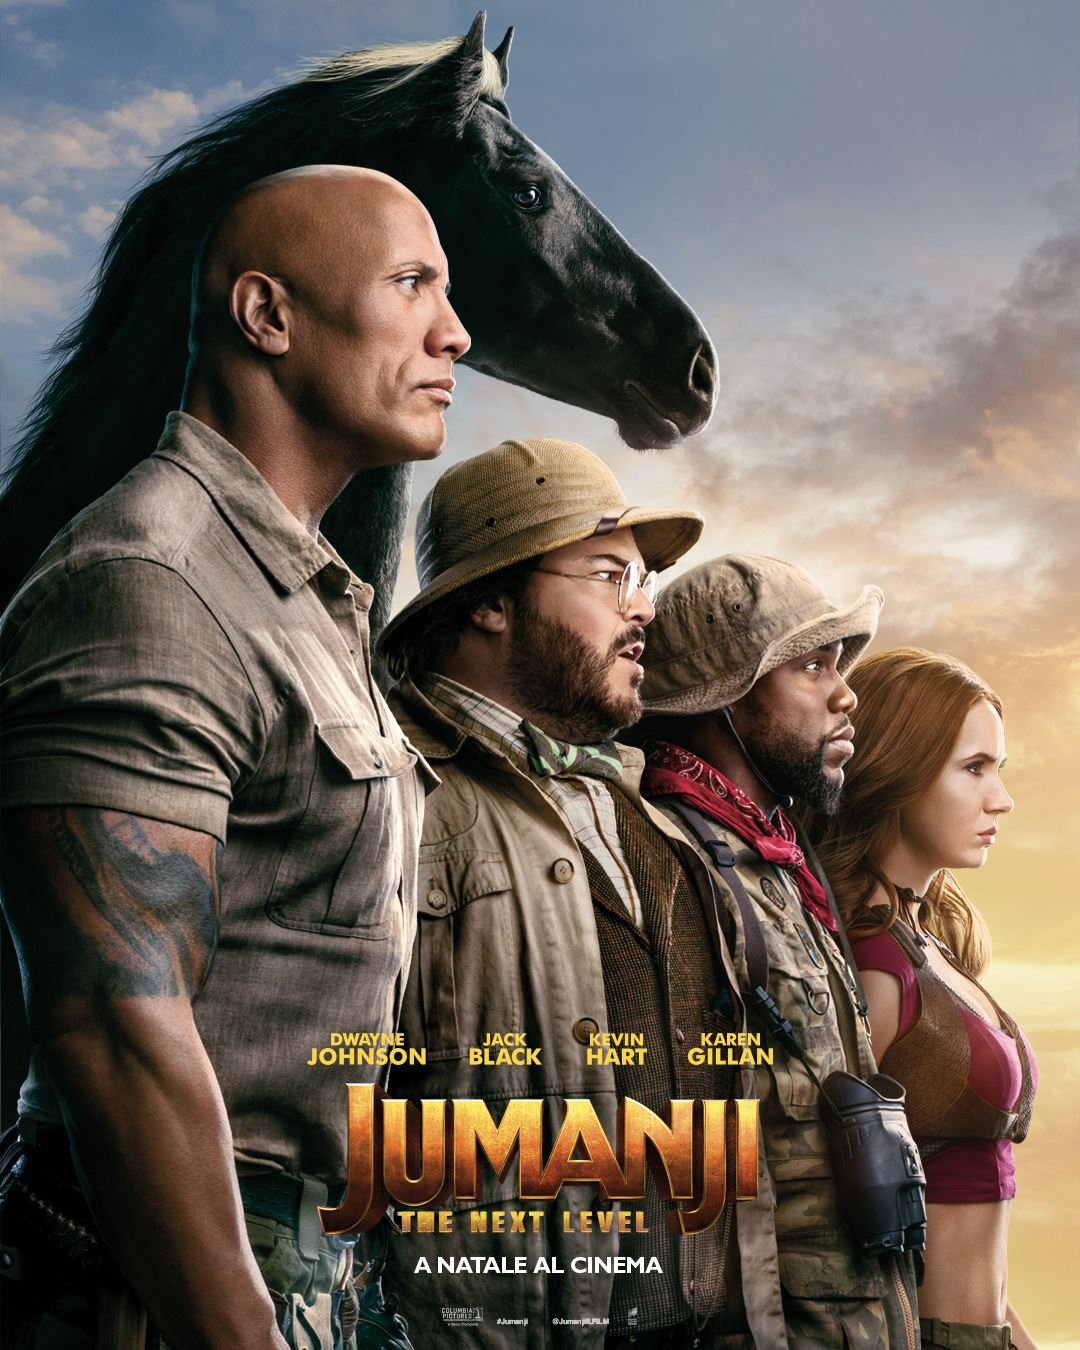 L'ondata nostalgica travolge i Millennials: al cinema il sequel di Jumanji